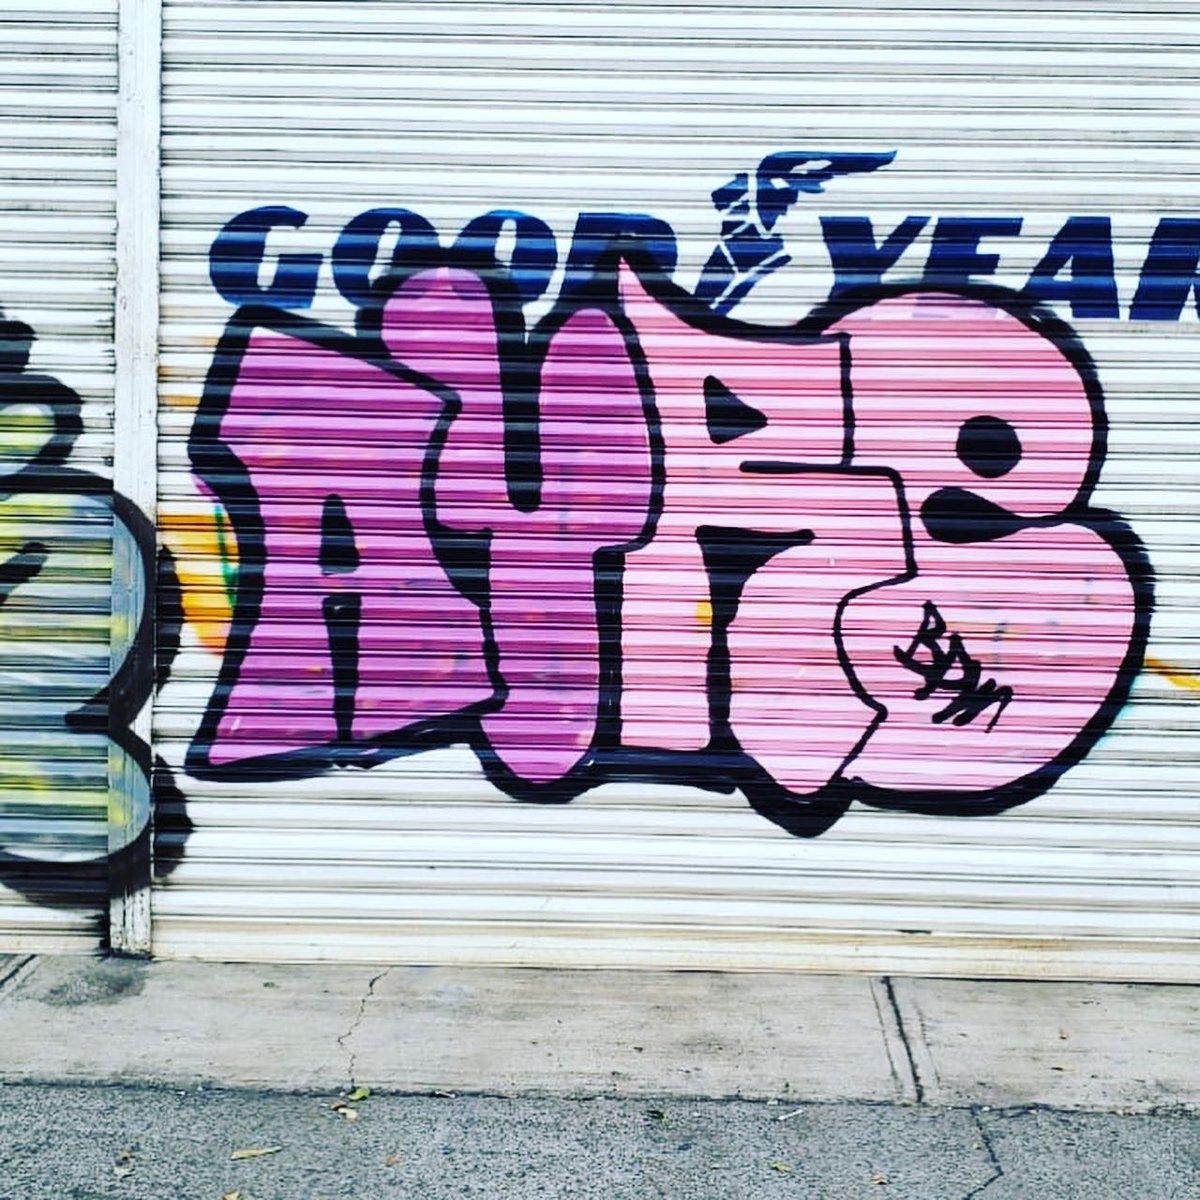 Air bombing Air bombing 2020 #graffiti #graffitiart #graffitimx #graffitimexico #grafittimx #graffitiphotography #graffitiletters #graffitiporn #graffitigers #graffitiwall #graffitigram #graffiti_magazine #graffitibombingpic.twitter.com/h2mbGyYxsP